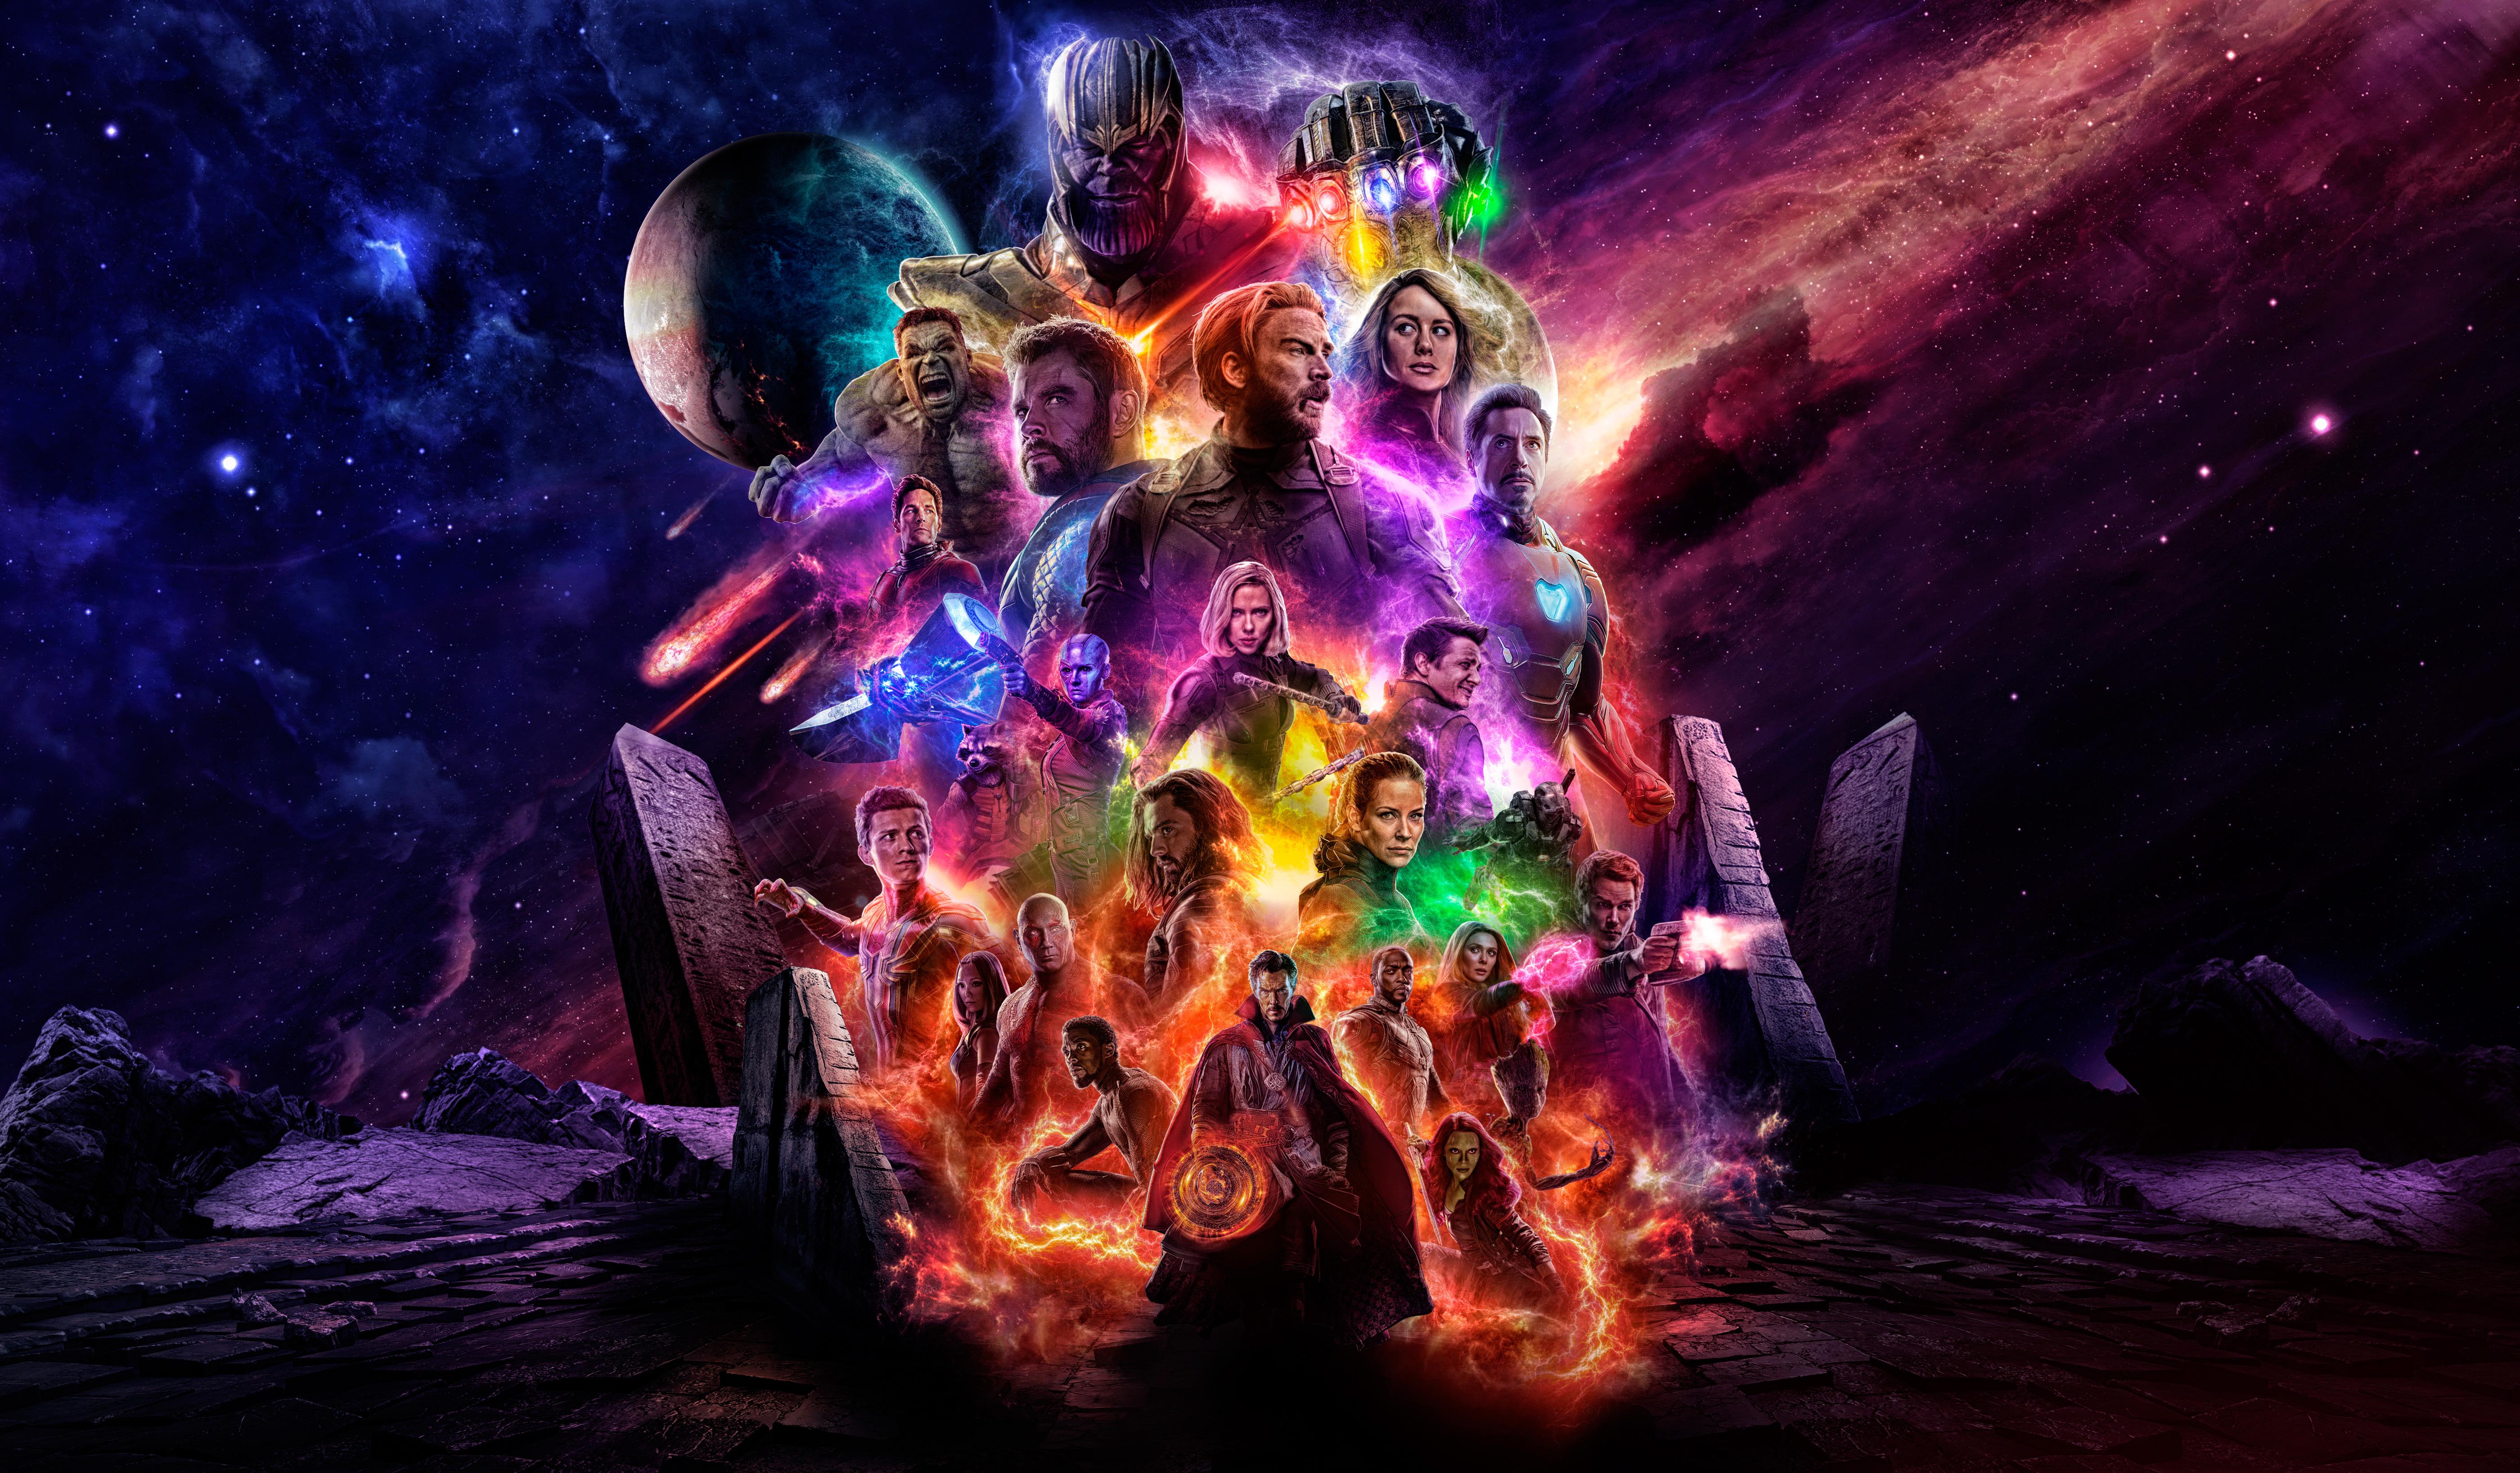 Movie Poster 2019: 1125x2436 Avengers 4 Offical Poster Artwork 2019 5k Iphone